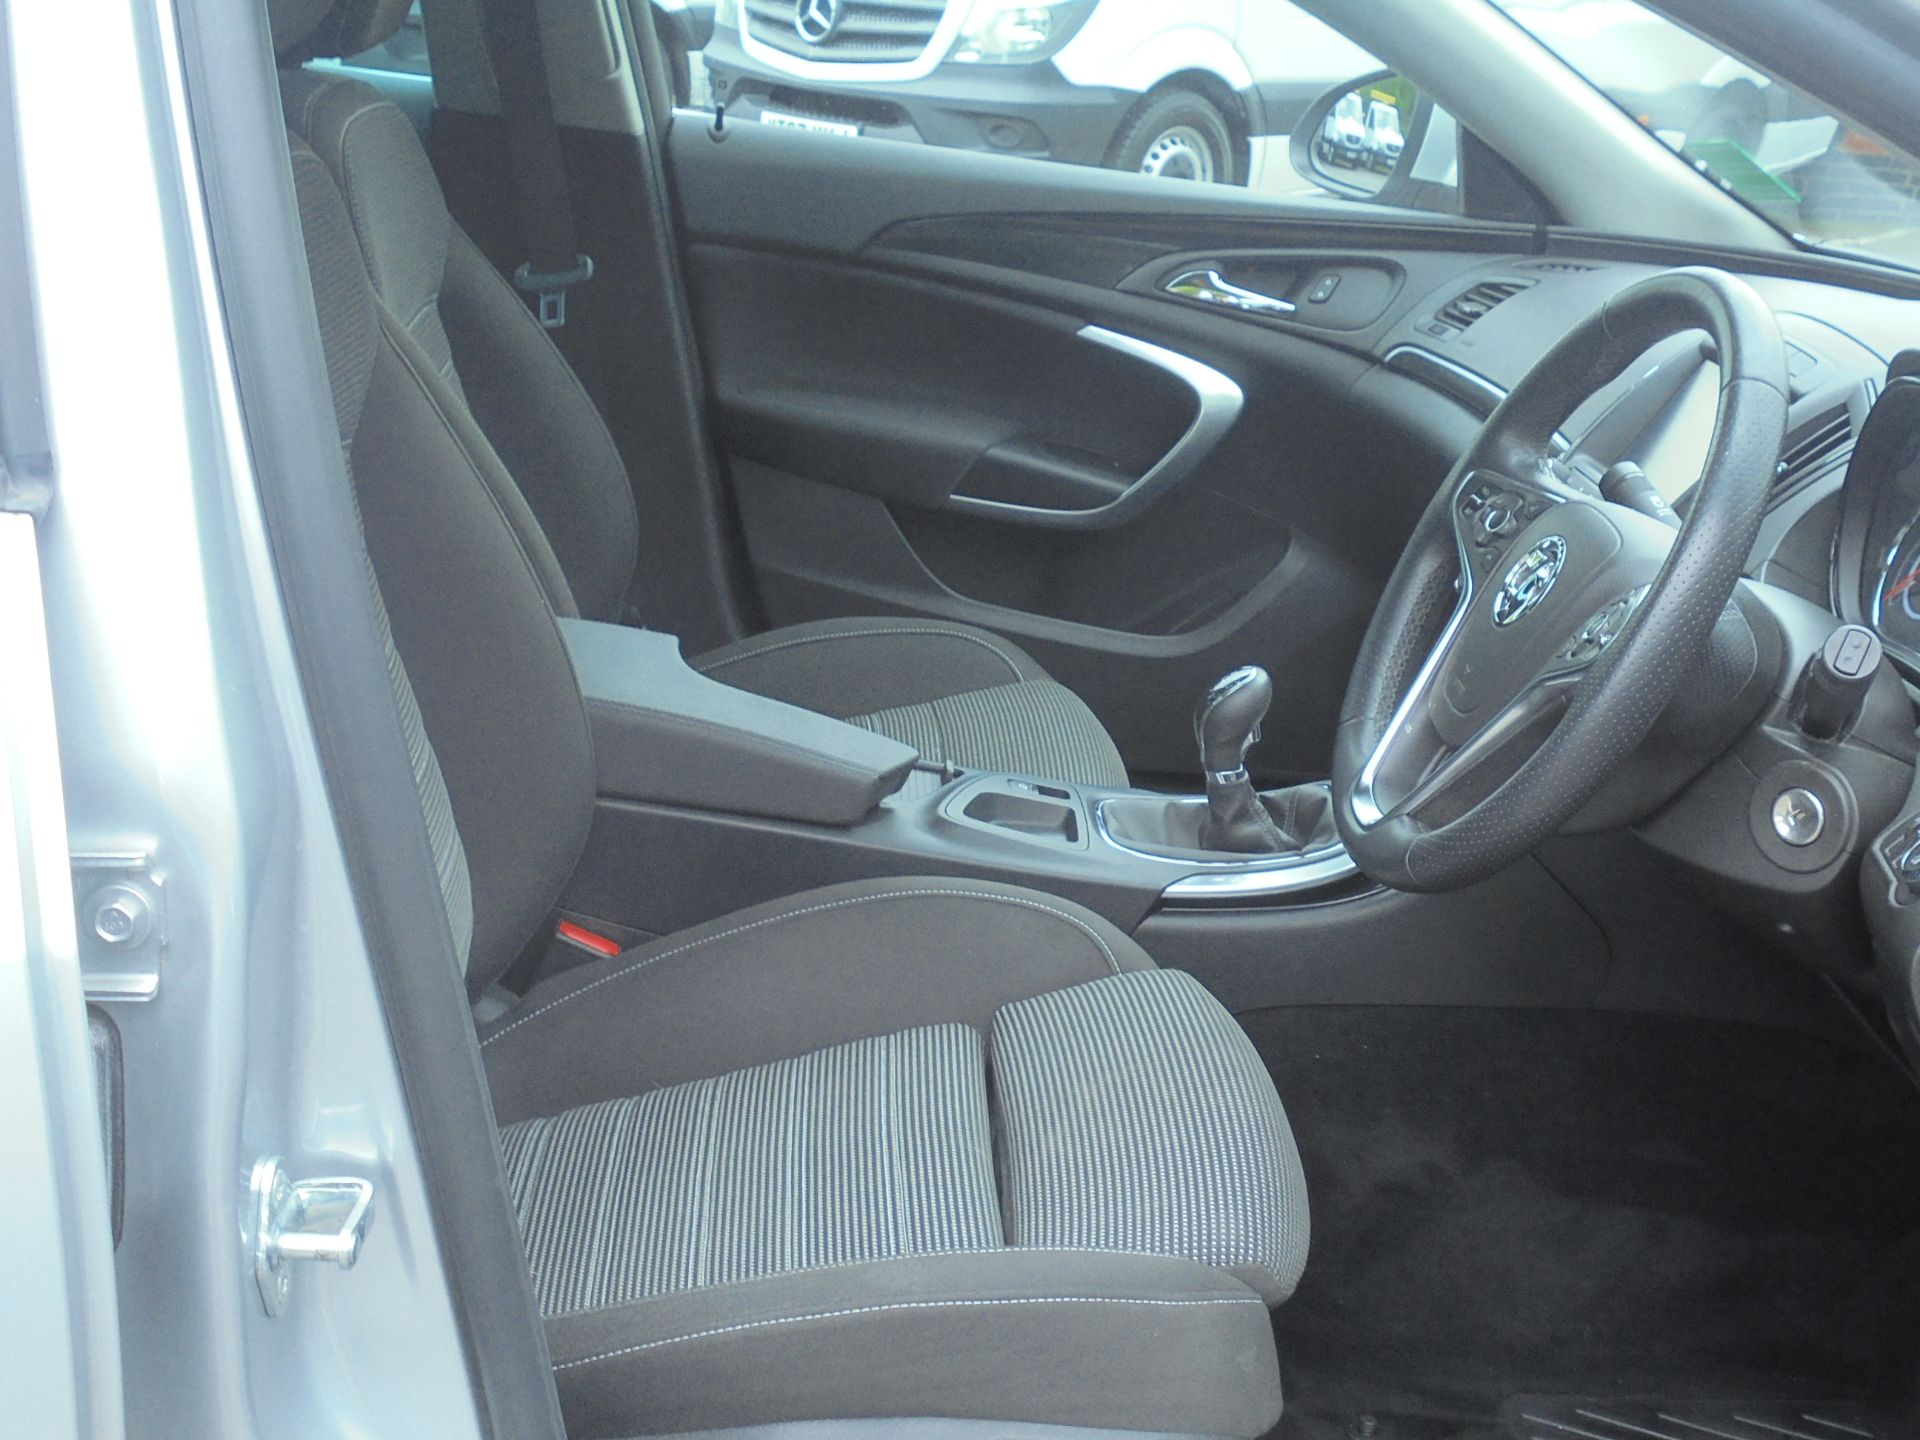 2016 Vauxhall Insignia 1.6 Cdti Sri Nav 5Dr [Start Stop] (YT16YJX) Image 12